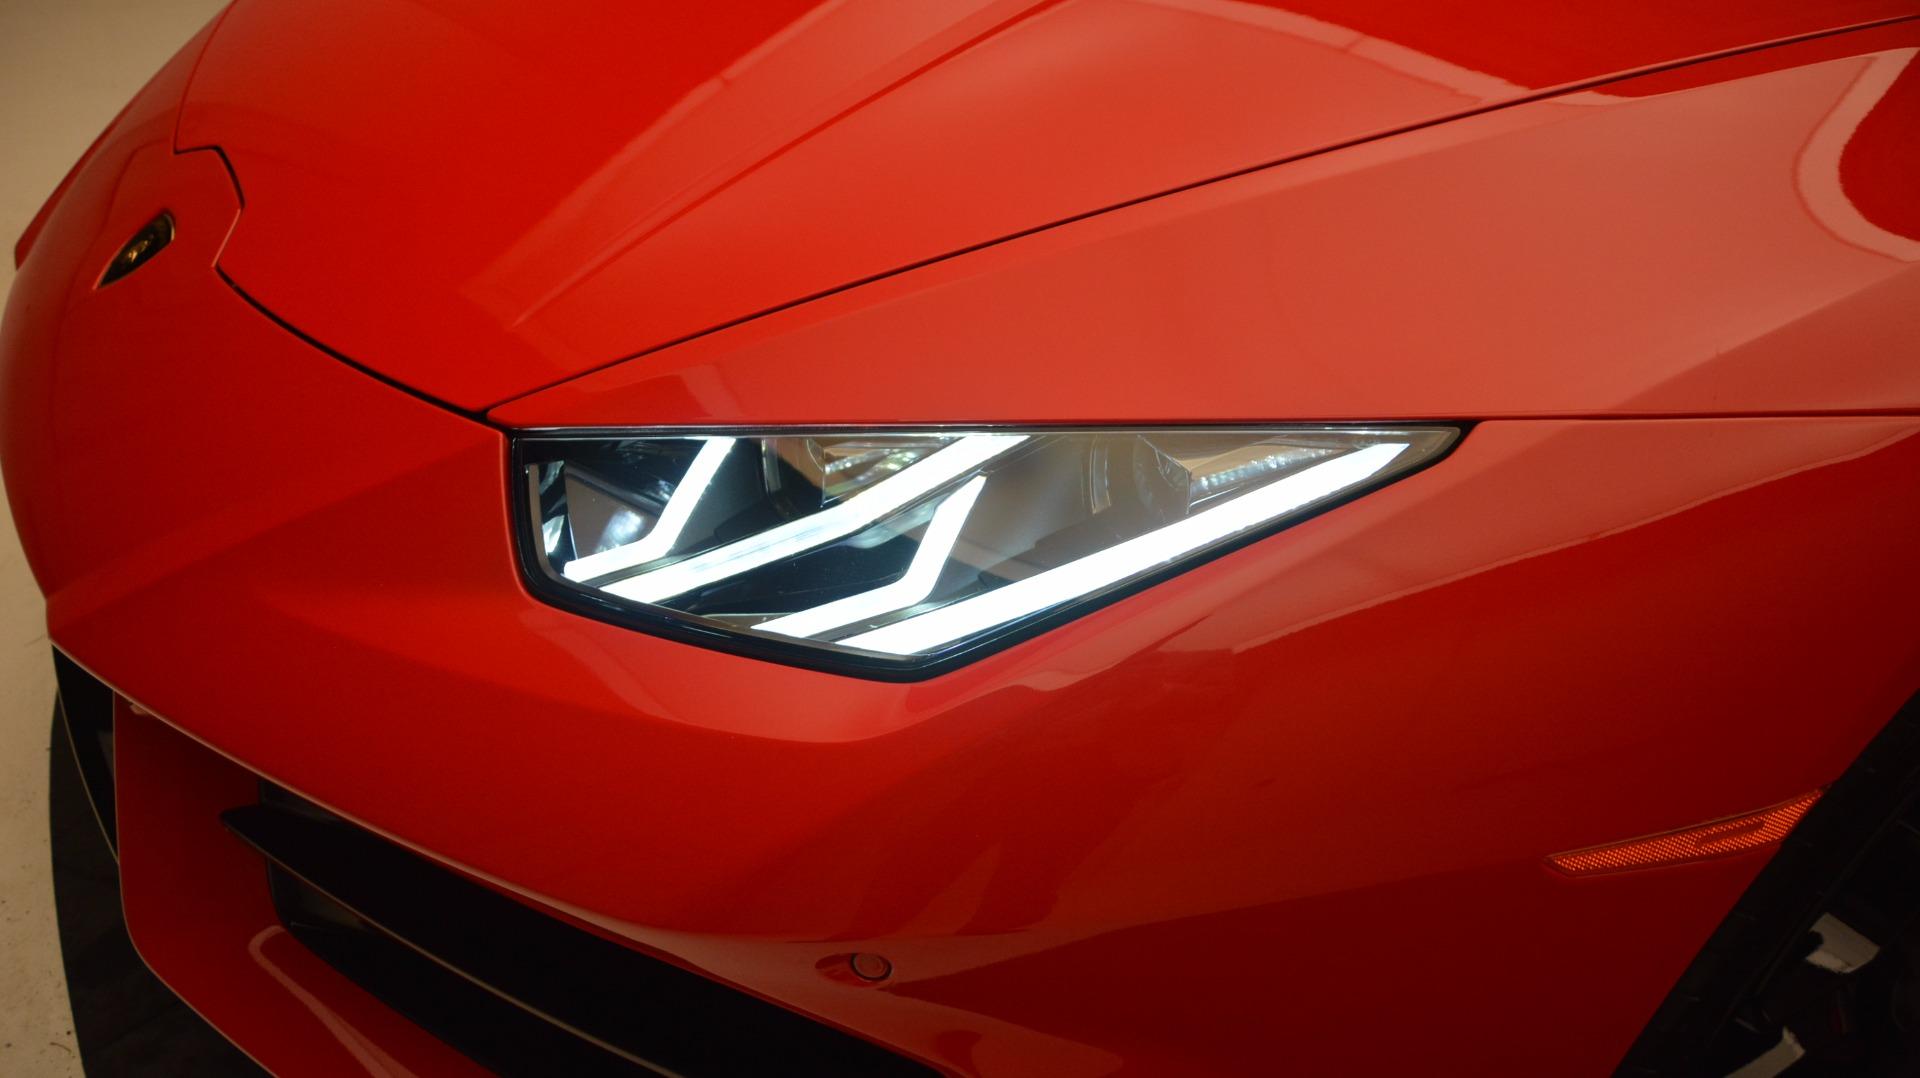 Used 2016 Lamborghini Huracan LP 580-2 For Sale In Greenwich, CT. Alfa Romeo of Greenwich, 7184 1070_p16